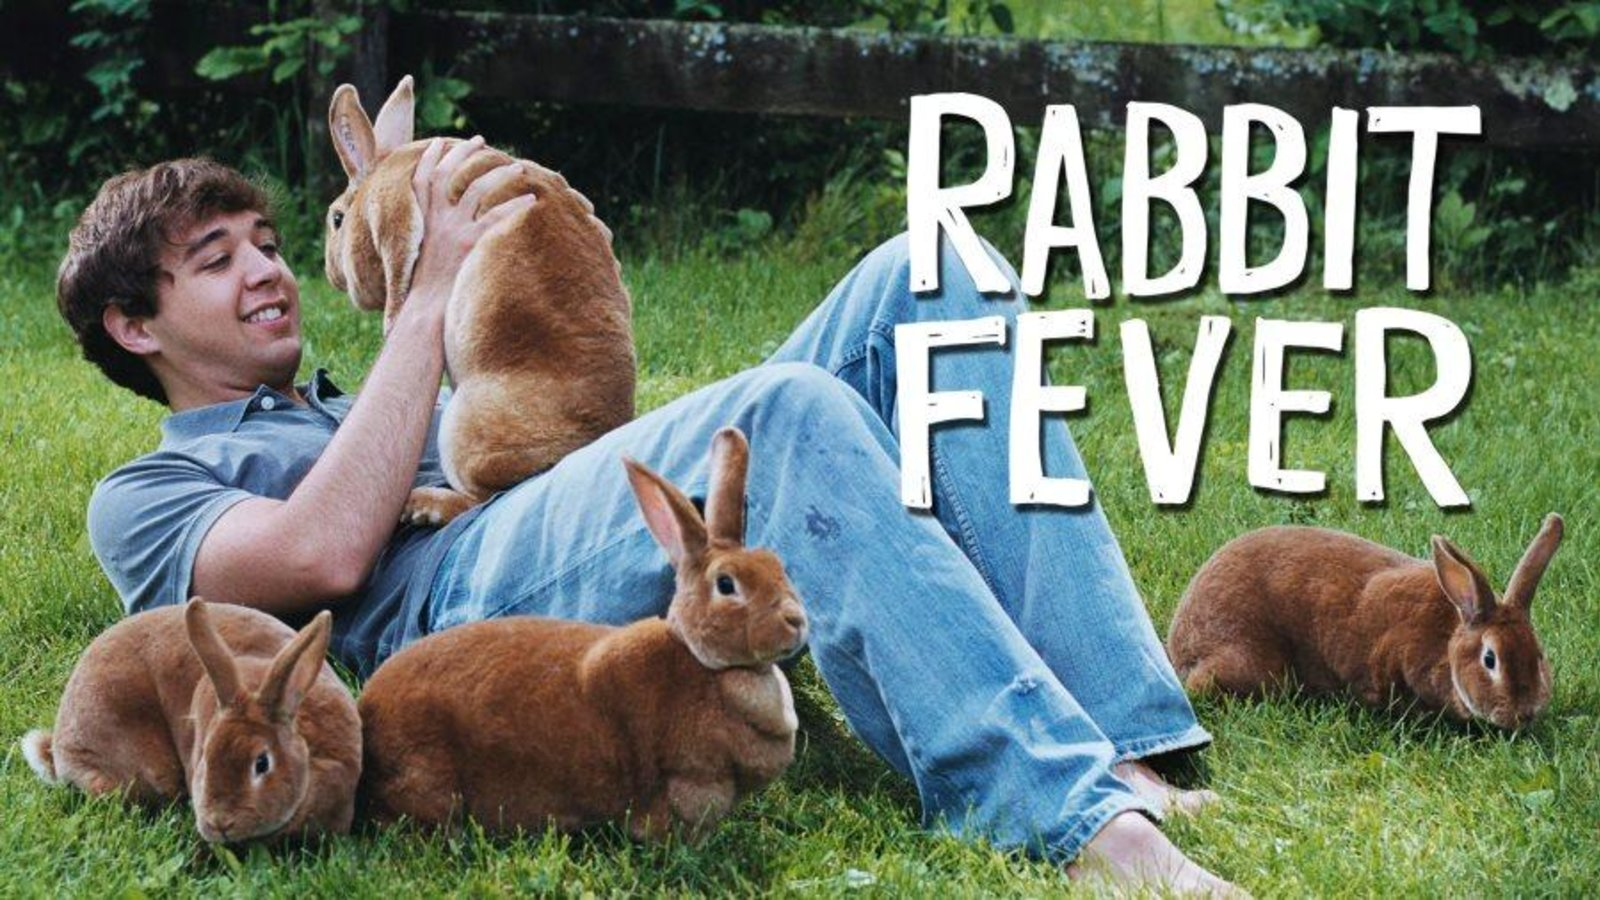 Rabbit Fever - Who Will Win Rabbit King & Queen?